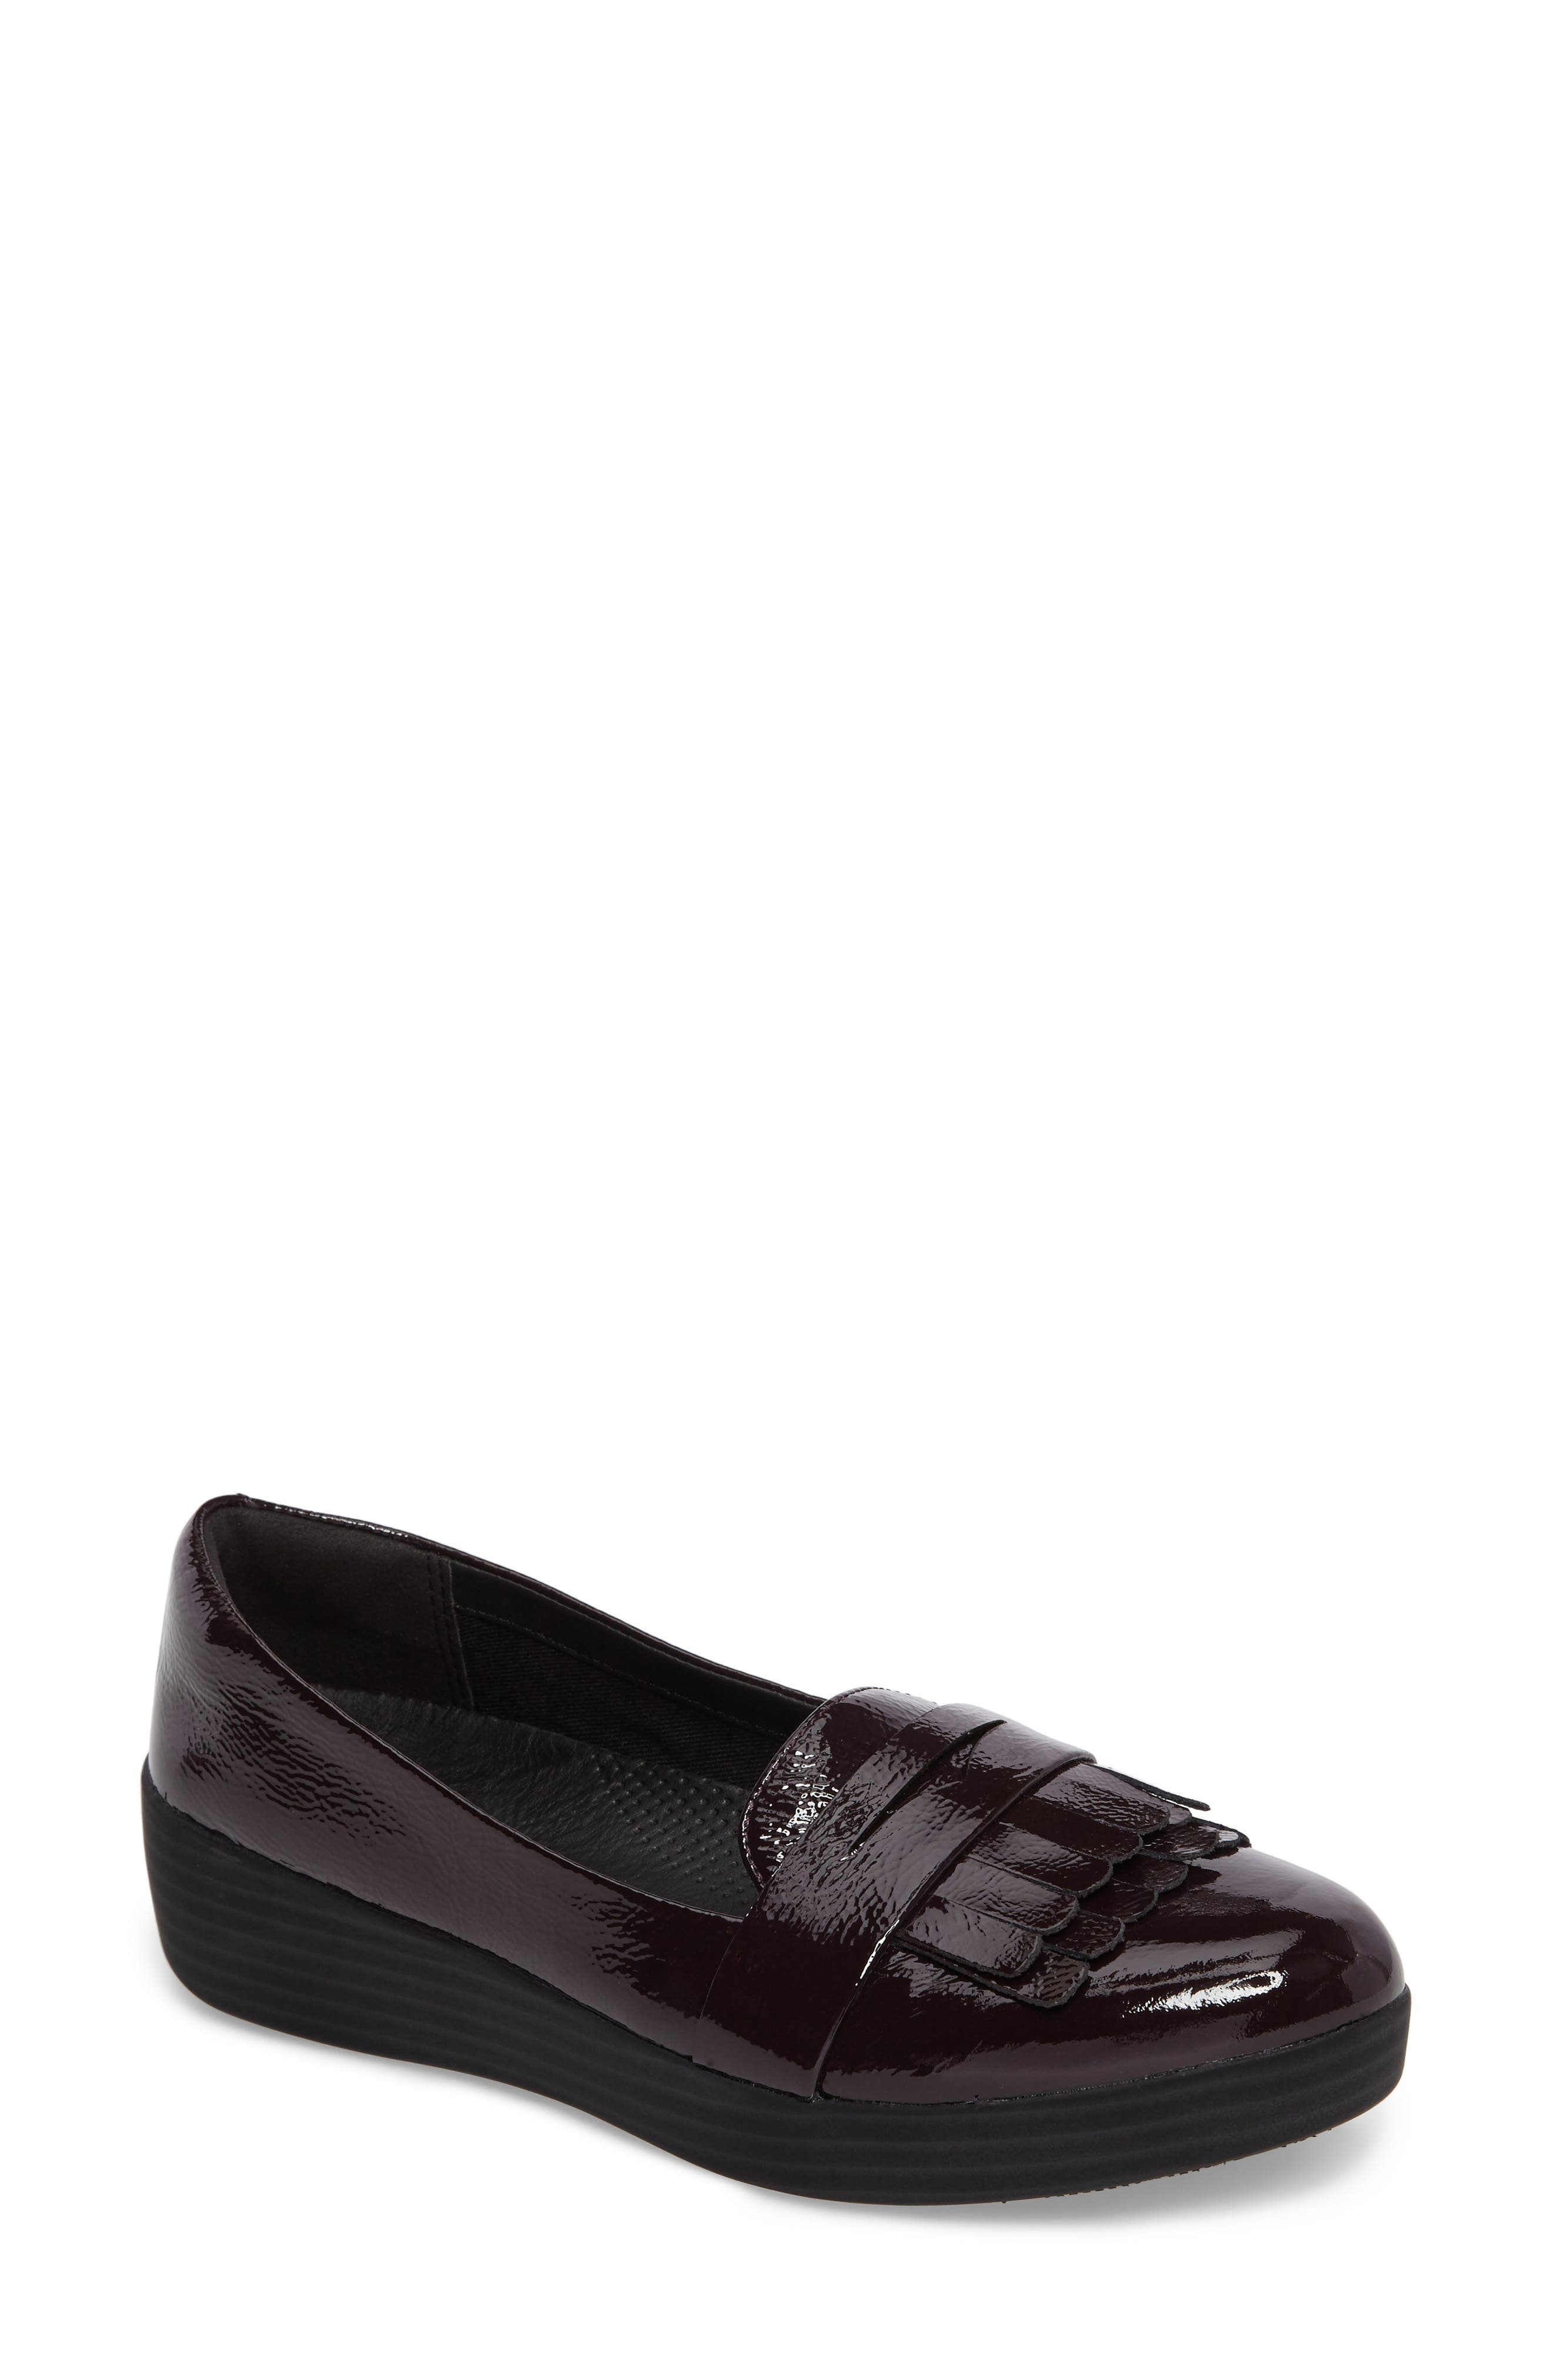 Fringey Sneakerloafer Slip-On,                             Main thumbnail 1, color,                             Deep Plum Leather